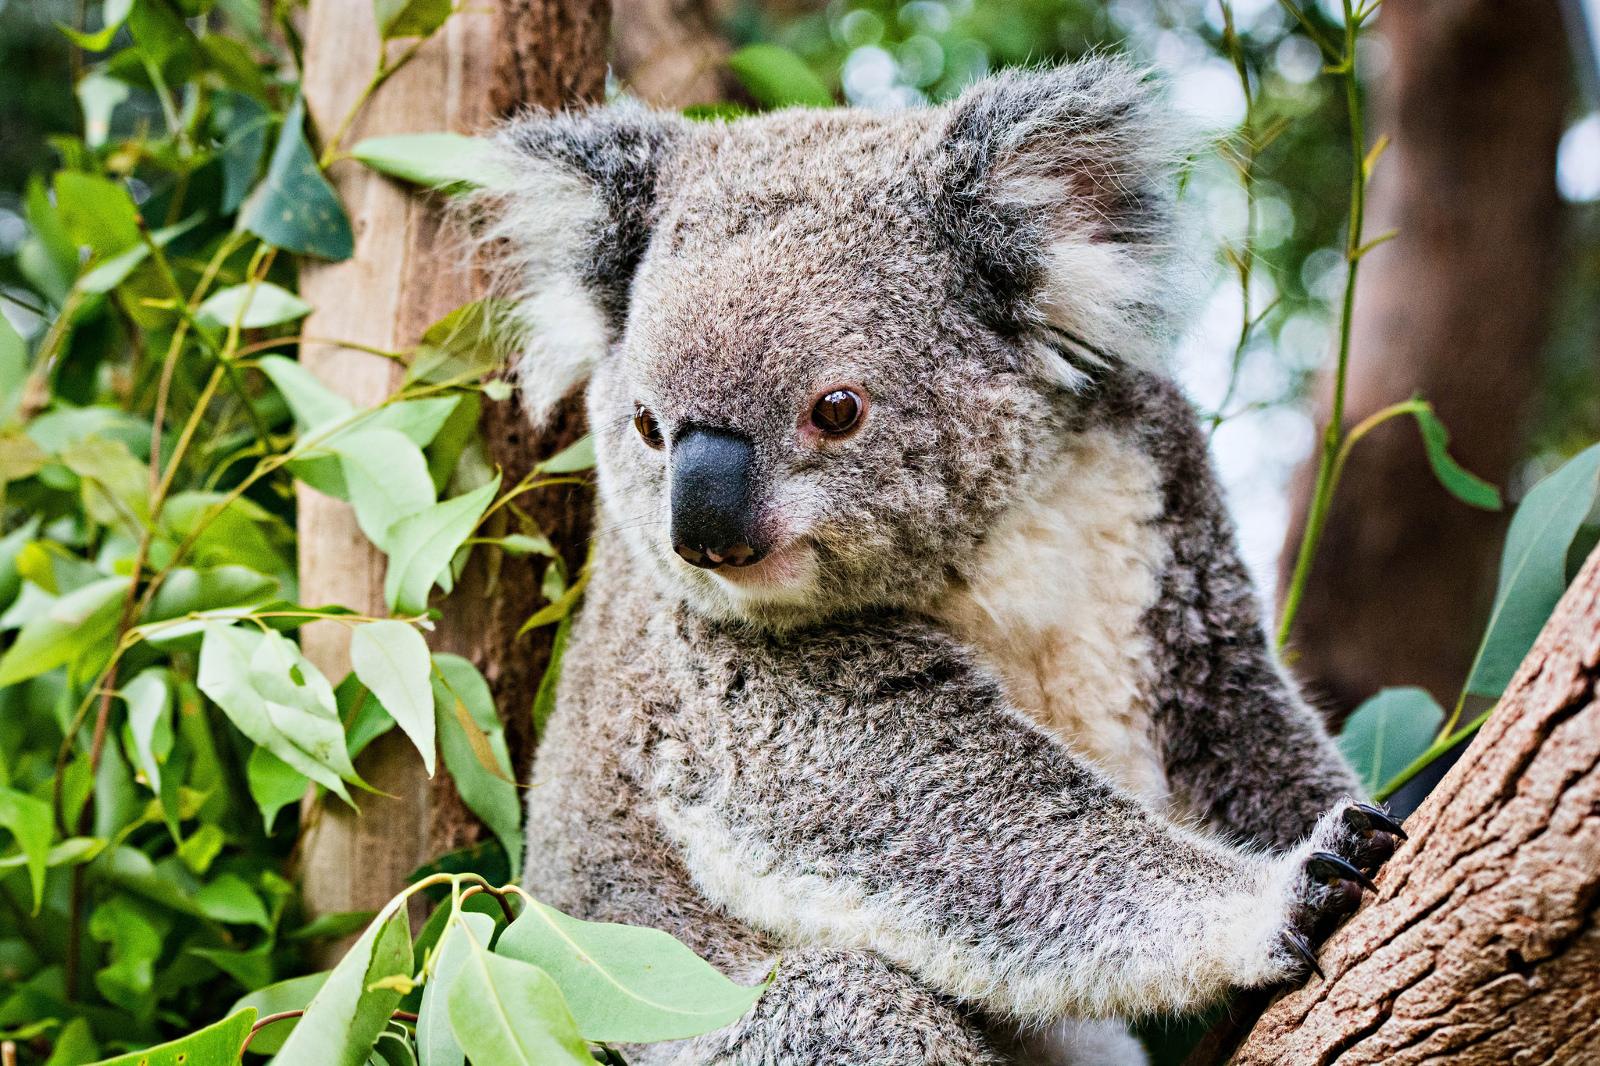 Why Are Koalas in Australia Starving?